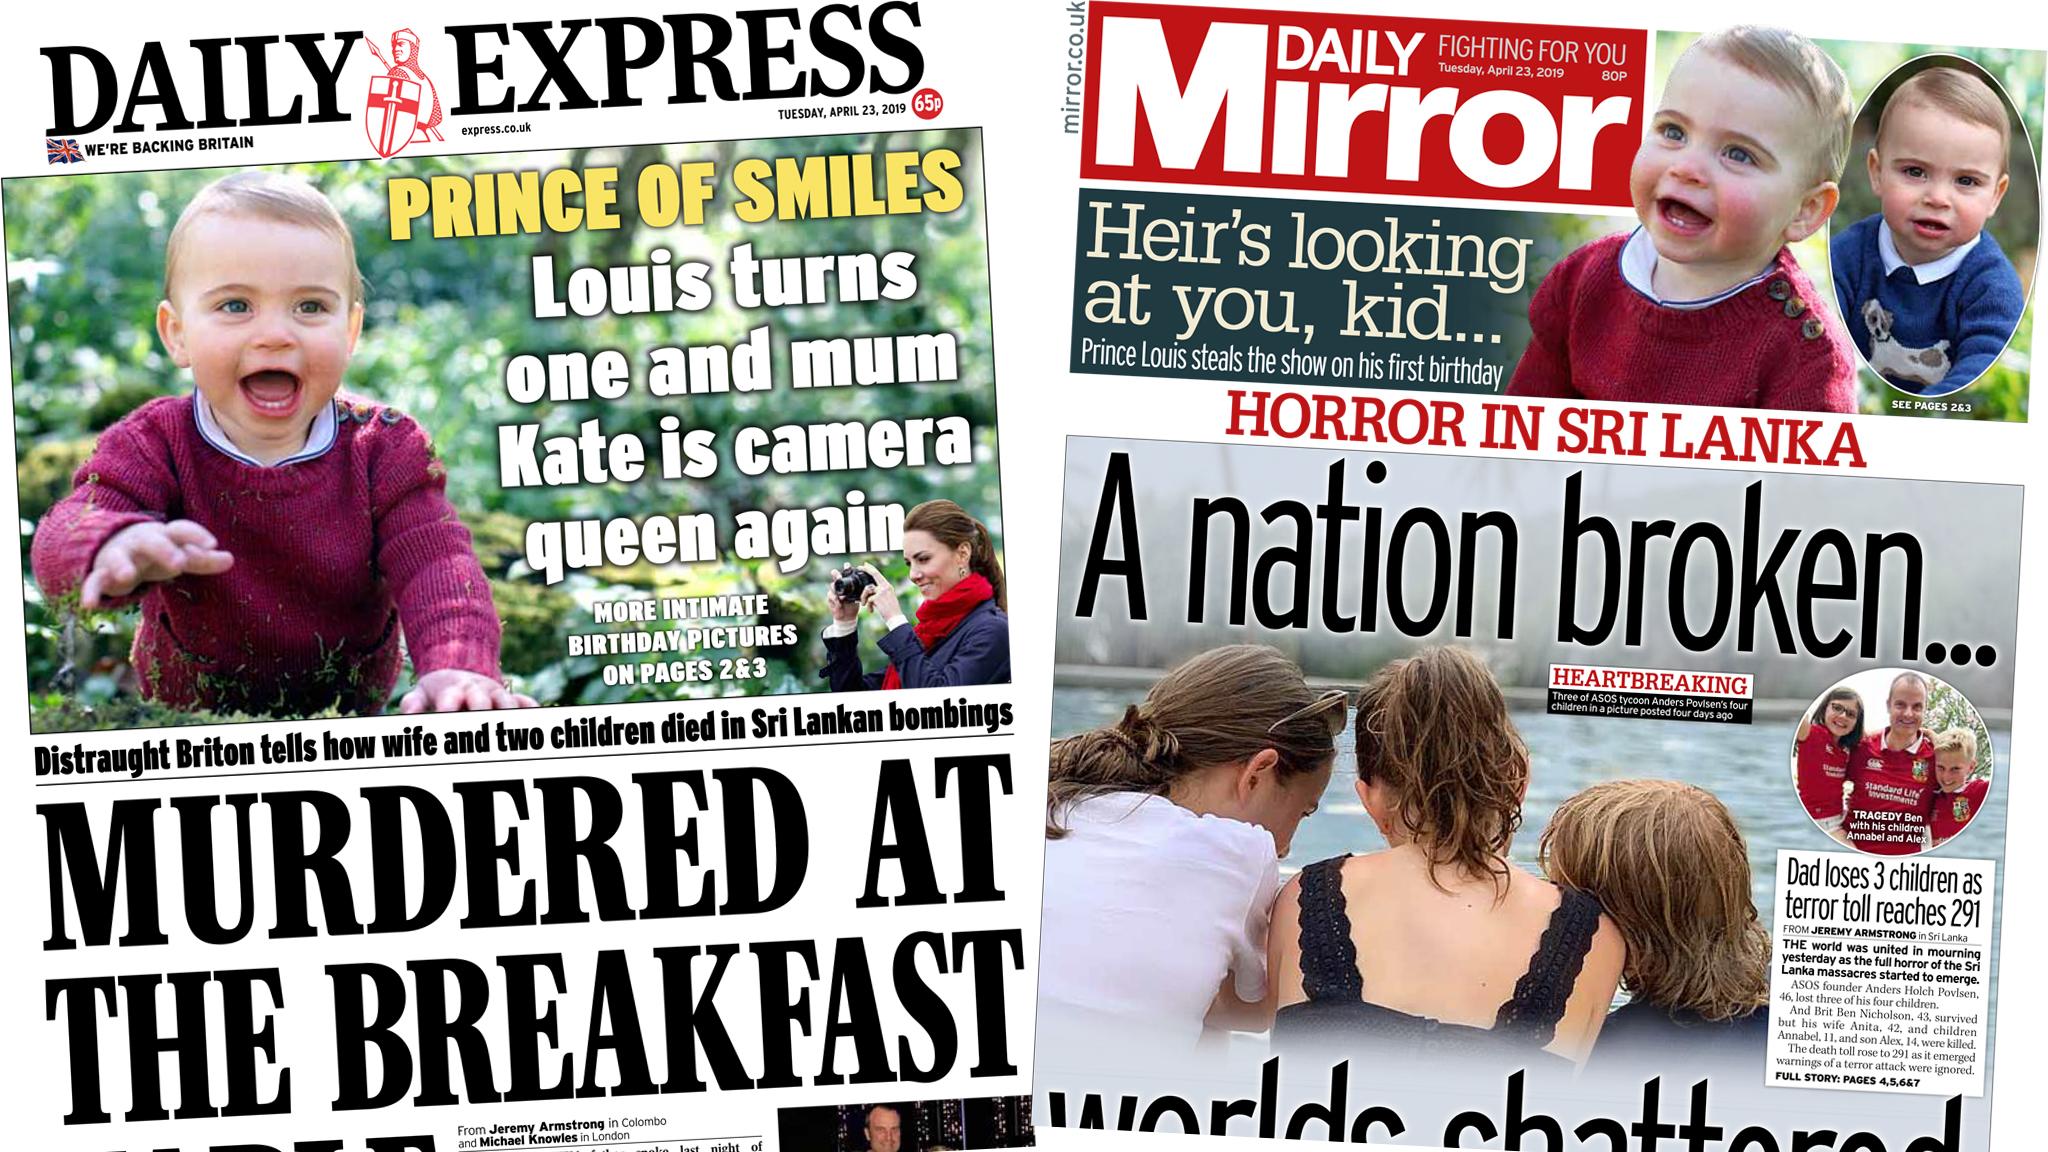 Newspaper headlines: 'A nation broken' by bombings